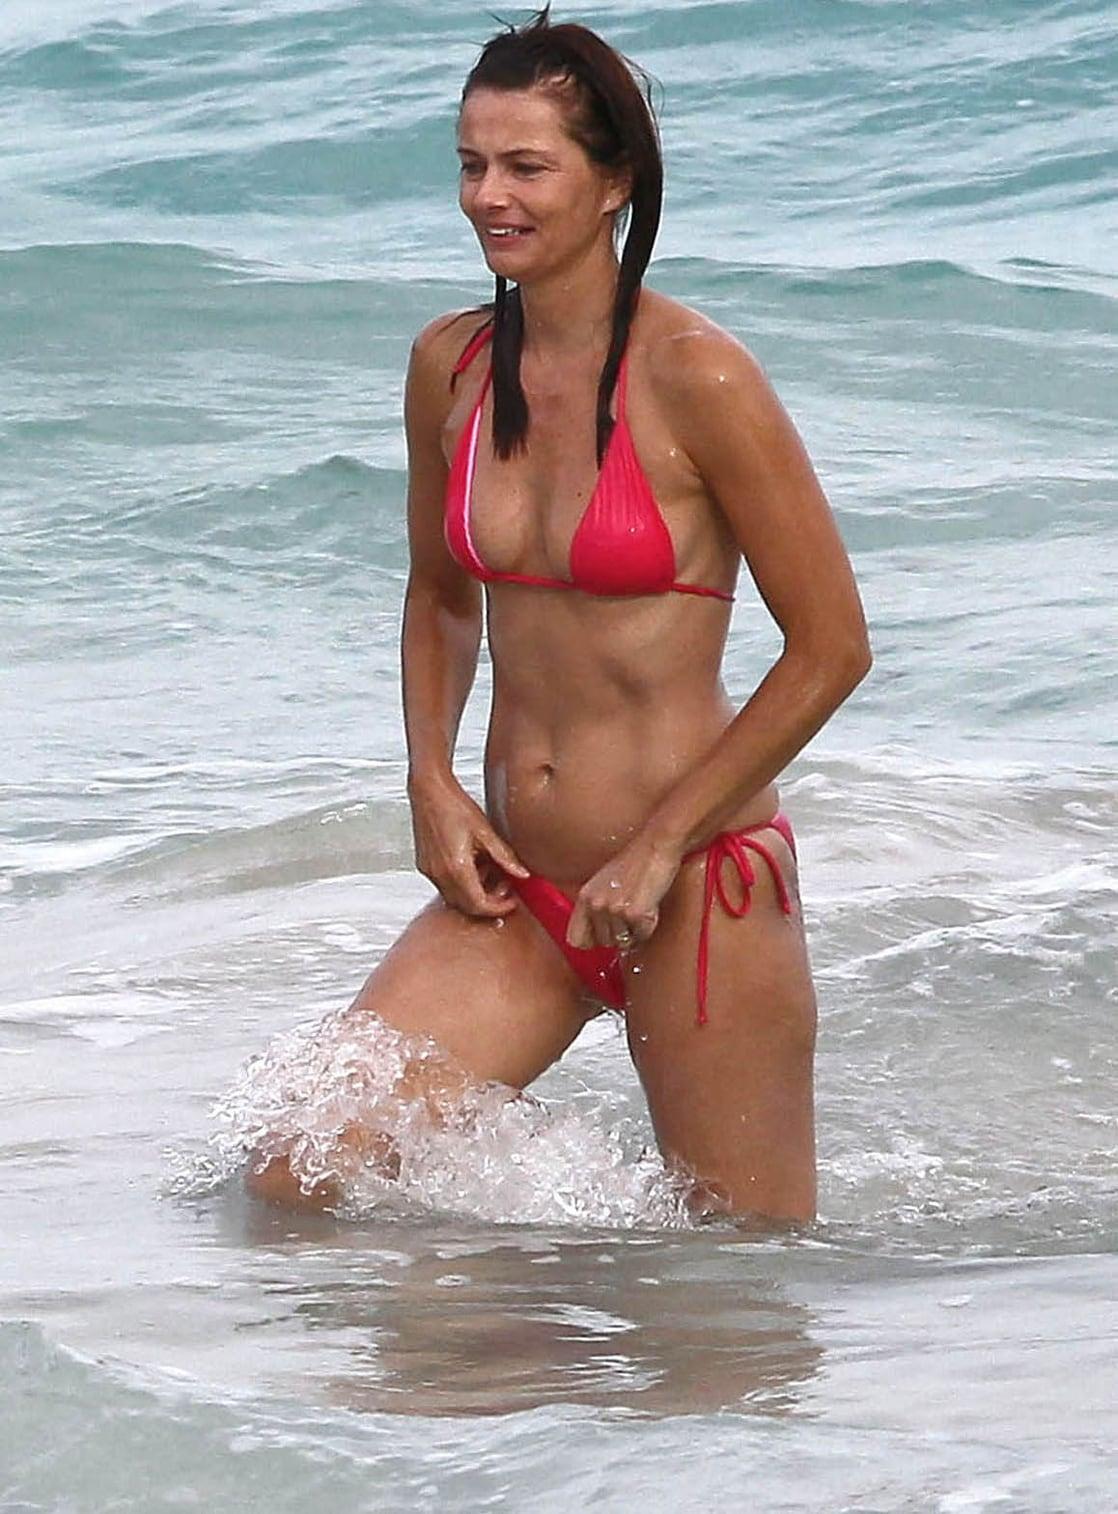 Bikini Paulina Porizkova nude (74 photo), Pussy, Bikini, Selfie, legs 2019